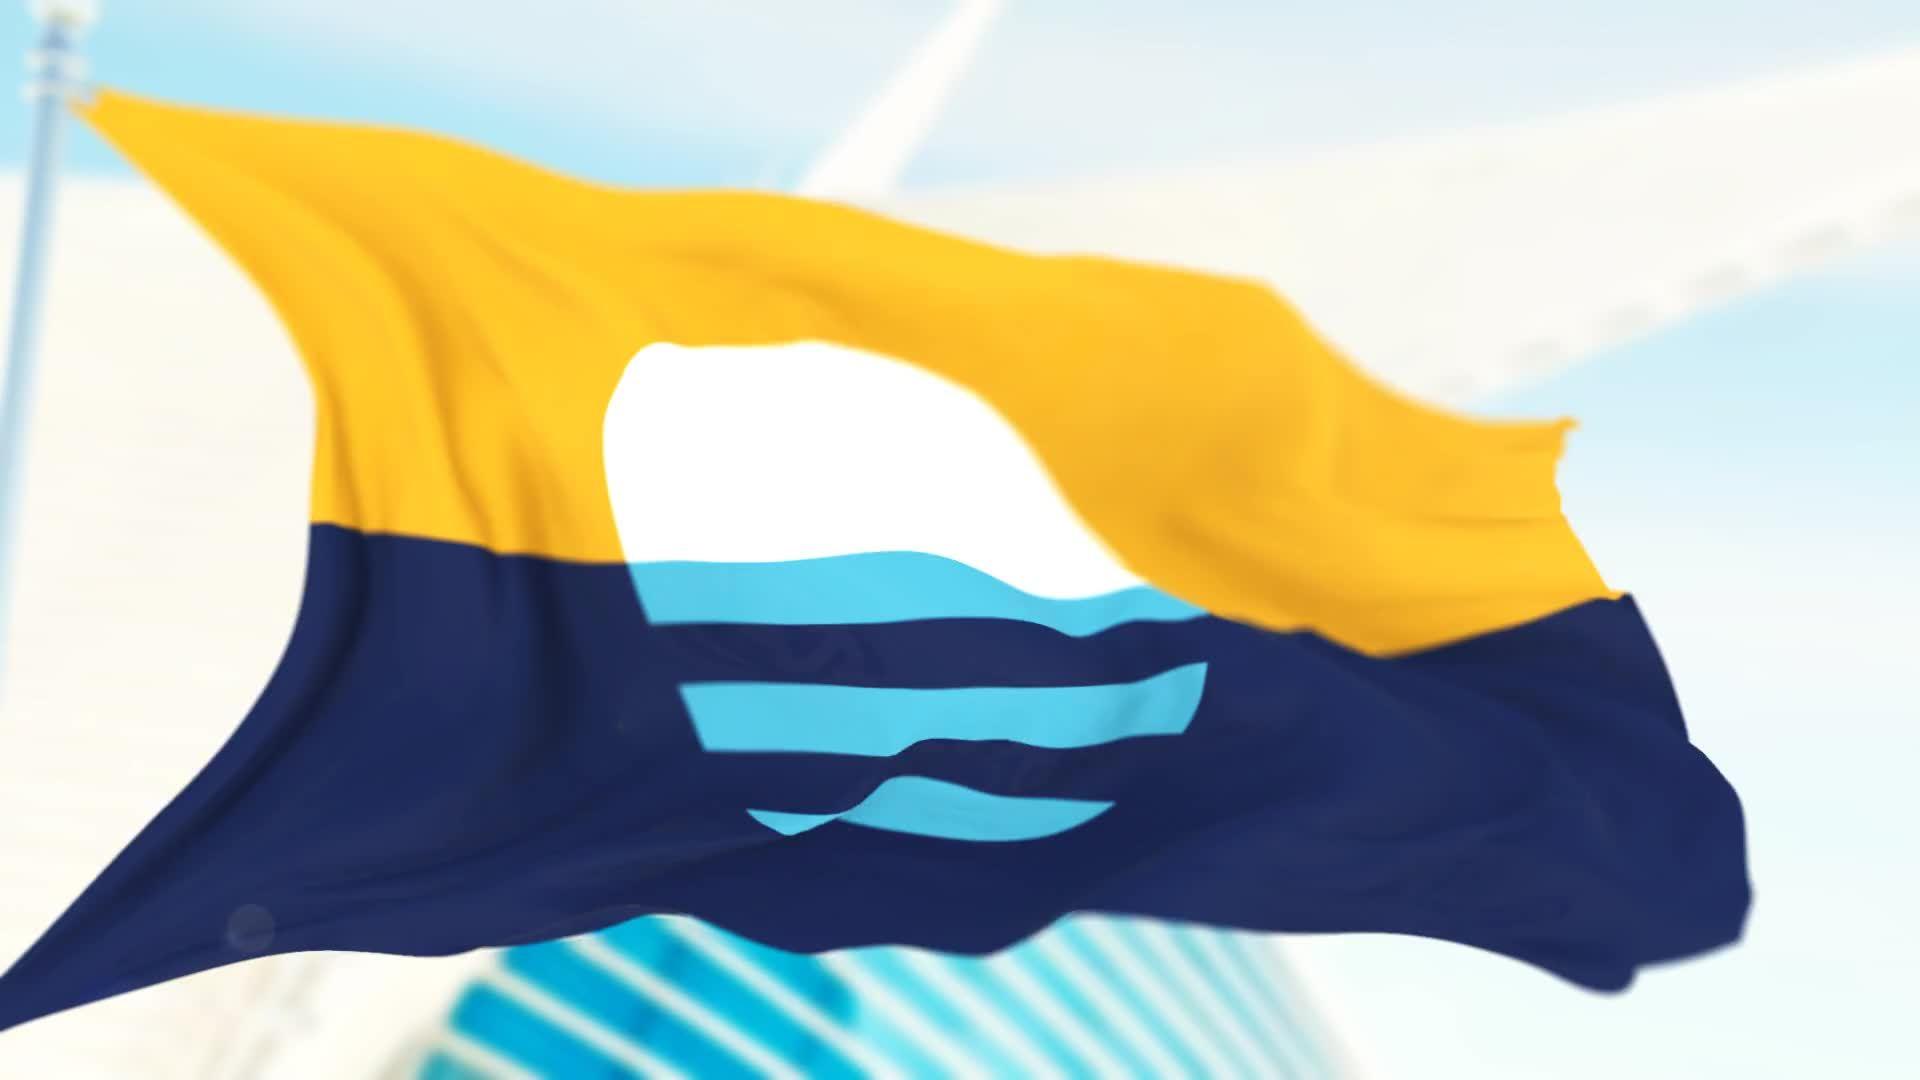 milwaukee, milwaukee flag, vexillology, People's Flag of Milwaukee Finalist: